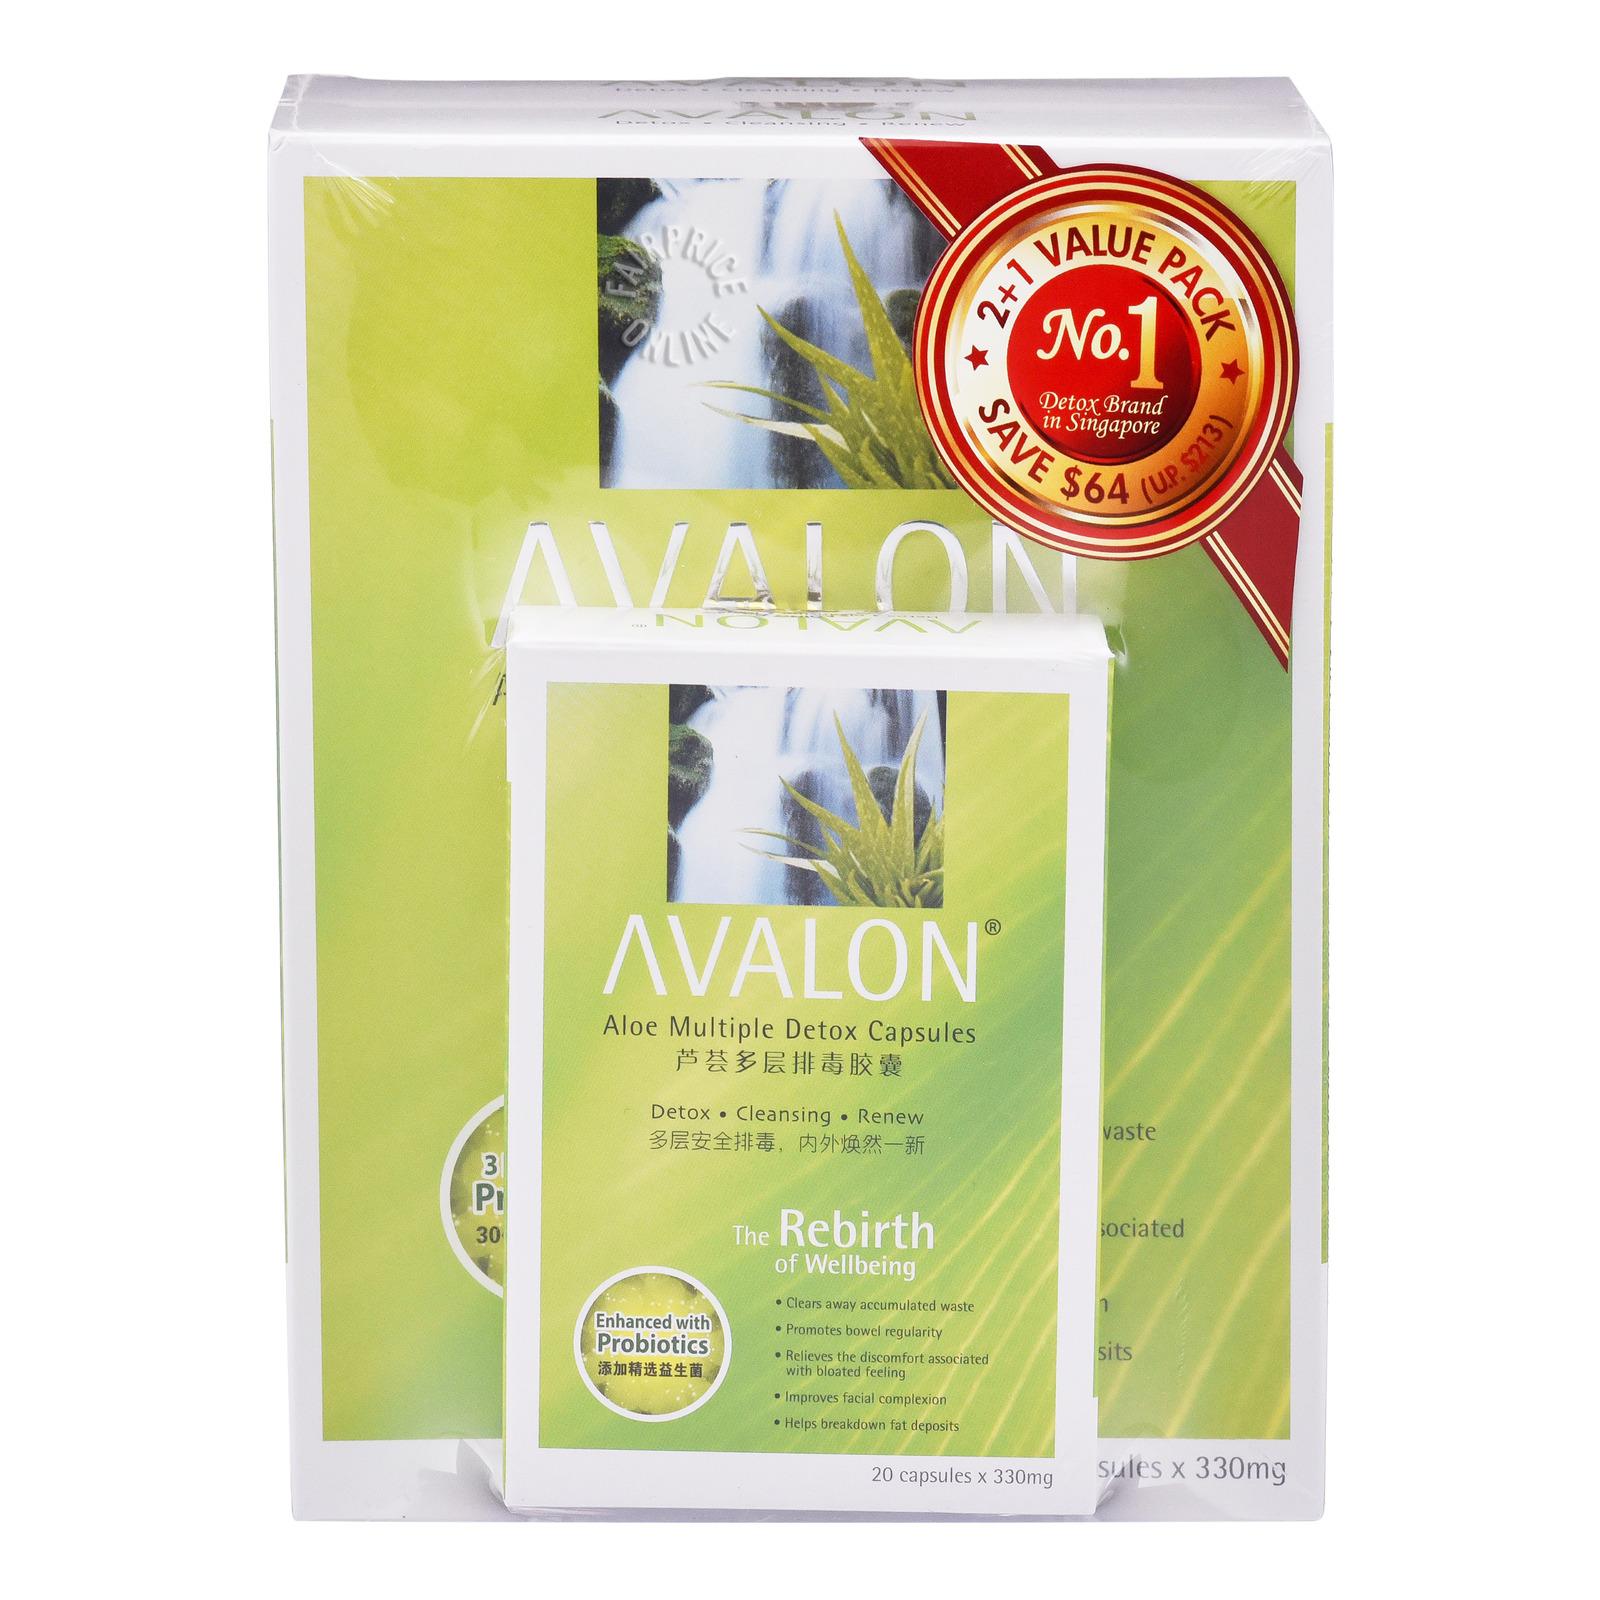 Avalon Aloe Multiple Detox Capsules